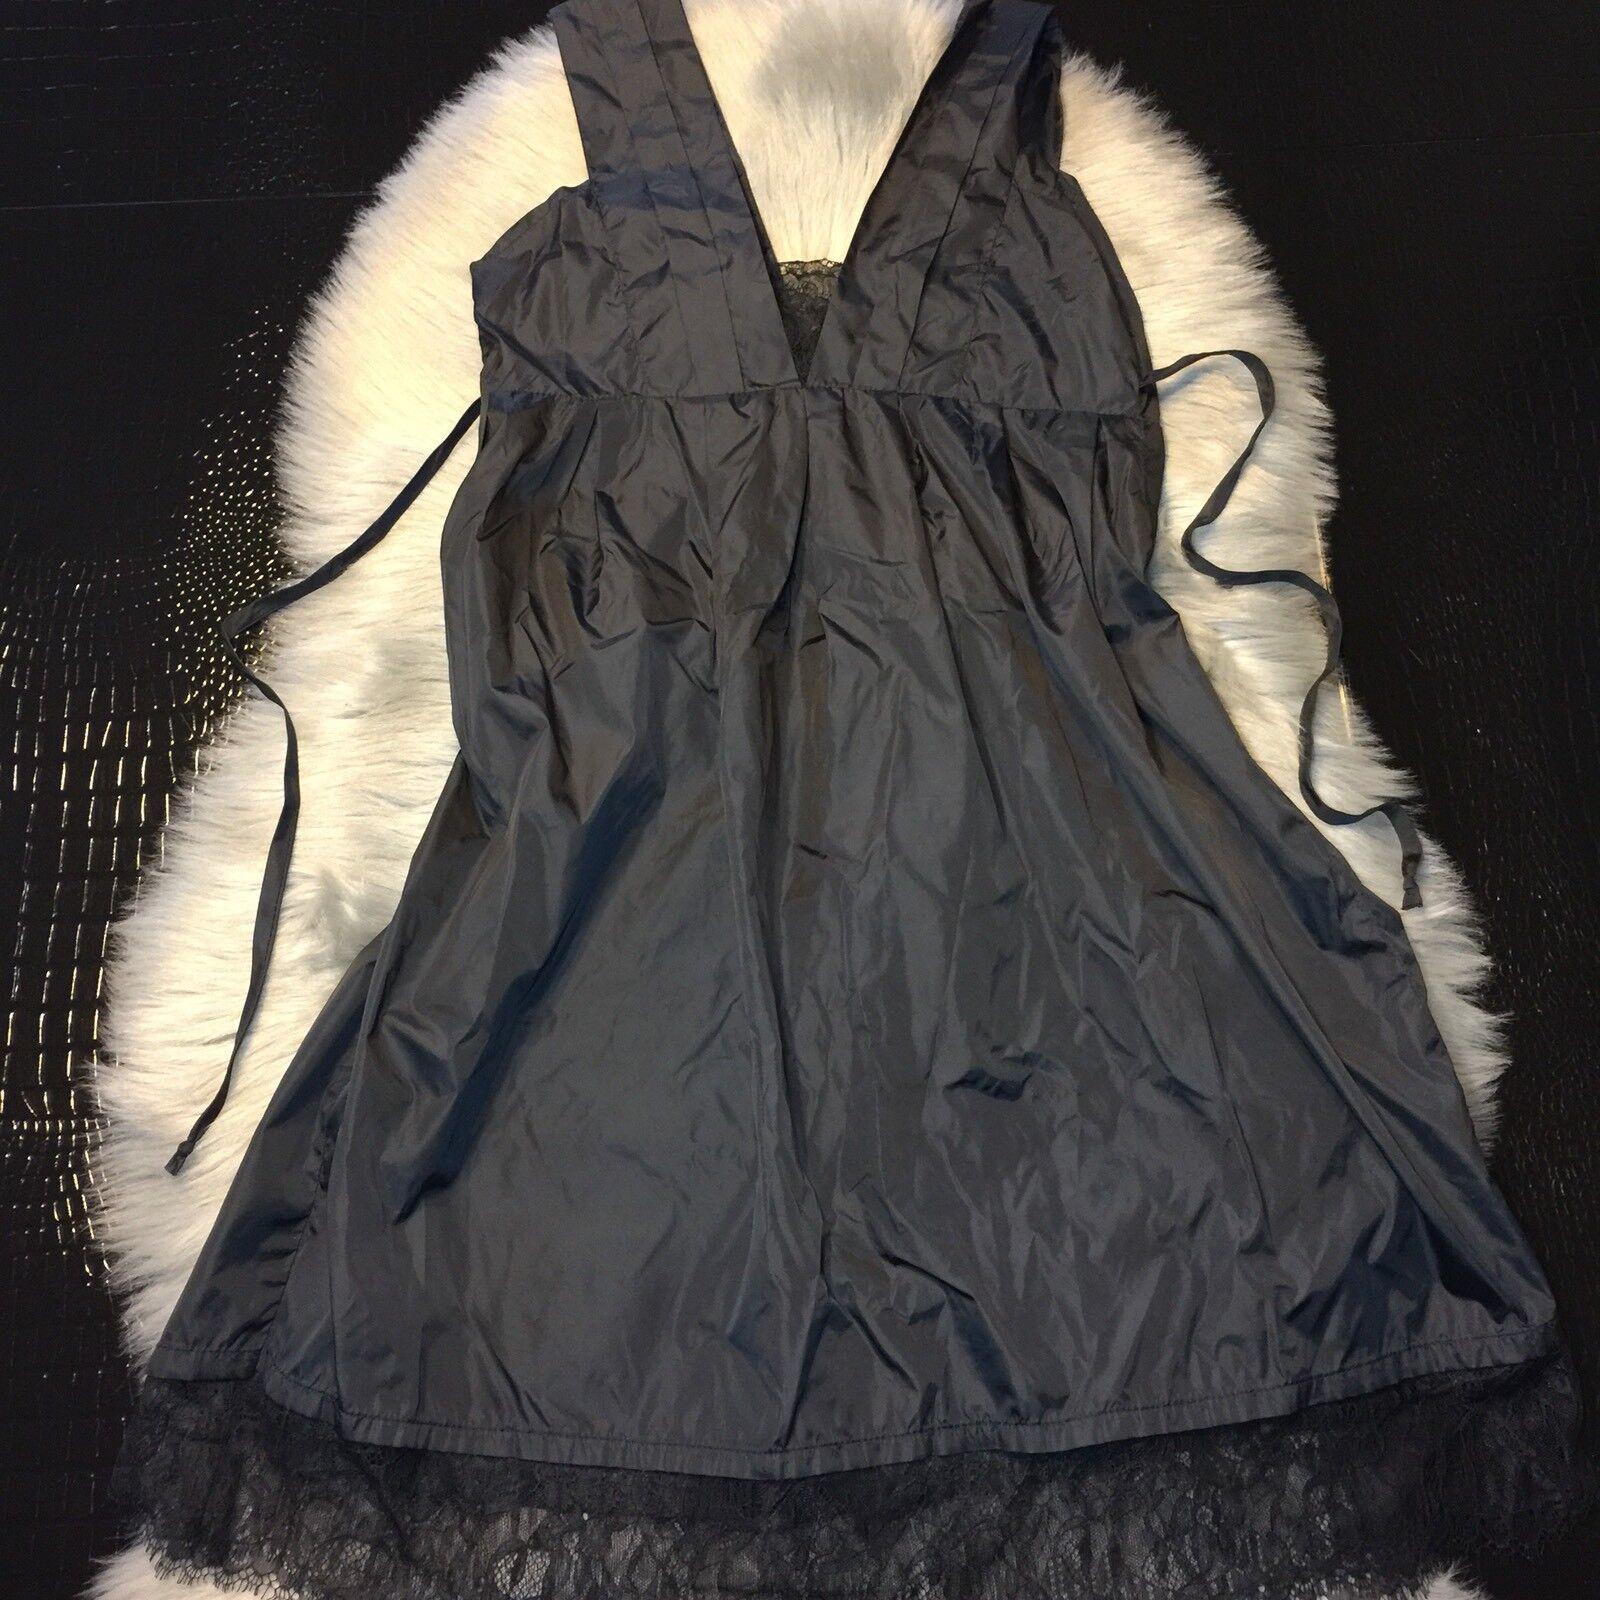 Debra Rodman Sexy schwarz Dress Größe 8 Lace Detail Nylon Texture NICE